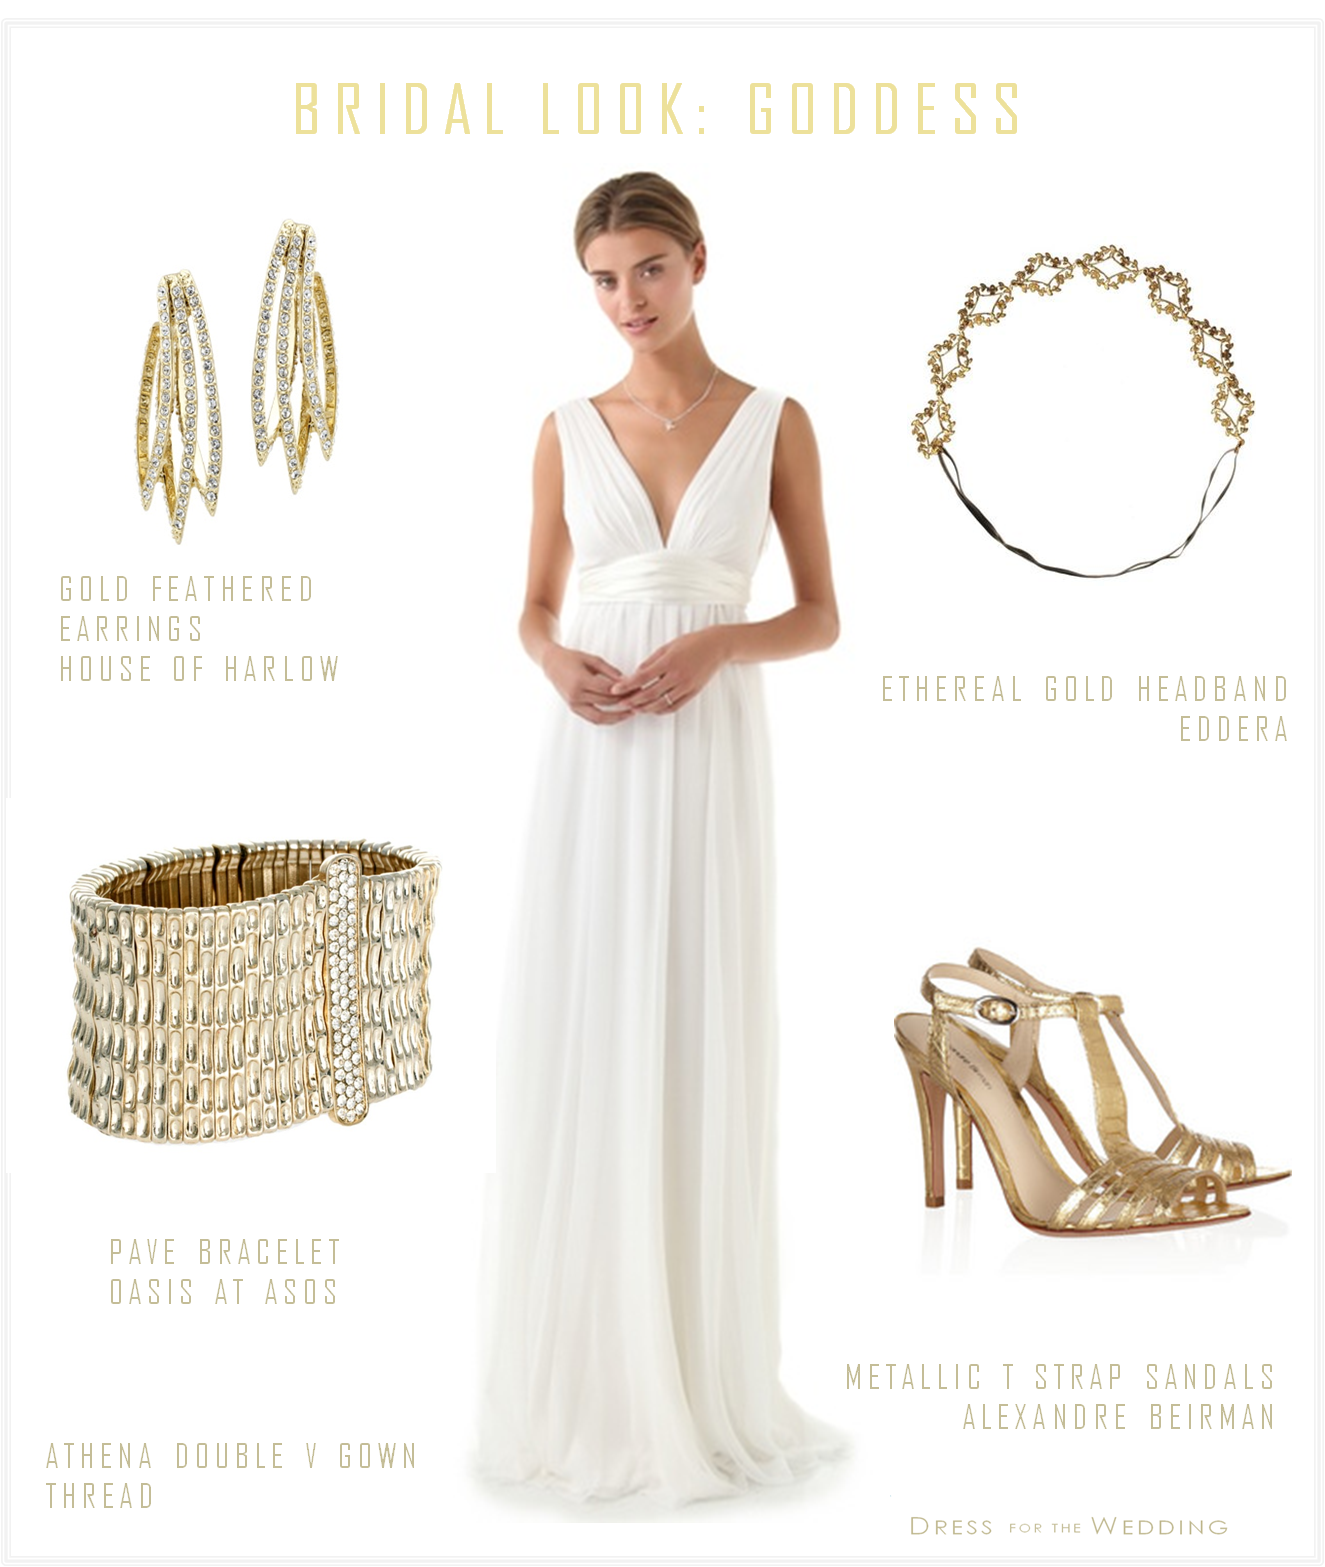 The dress goddess - A Greek Goddess Wedding Dress As Soon As I Saw This Athena Double V Wedding